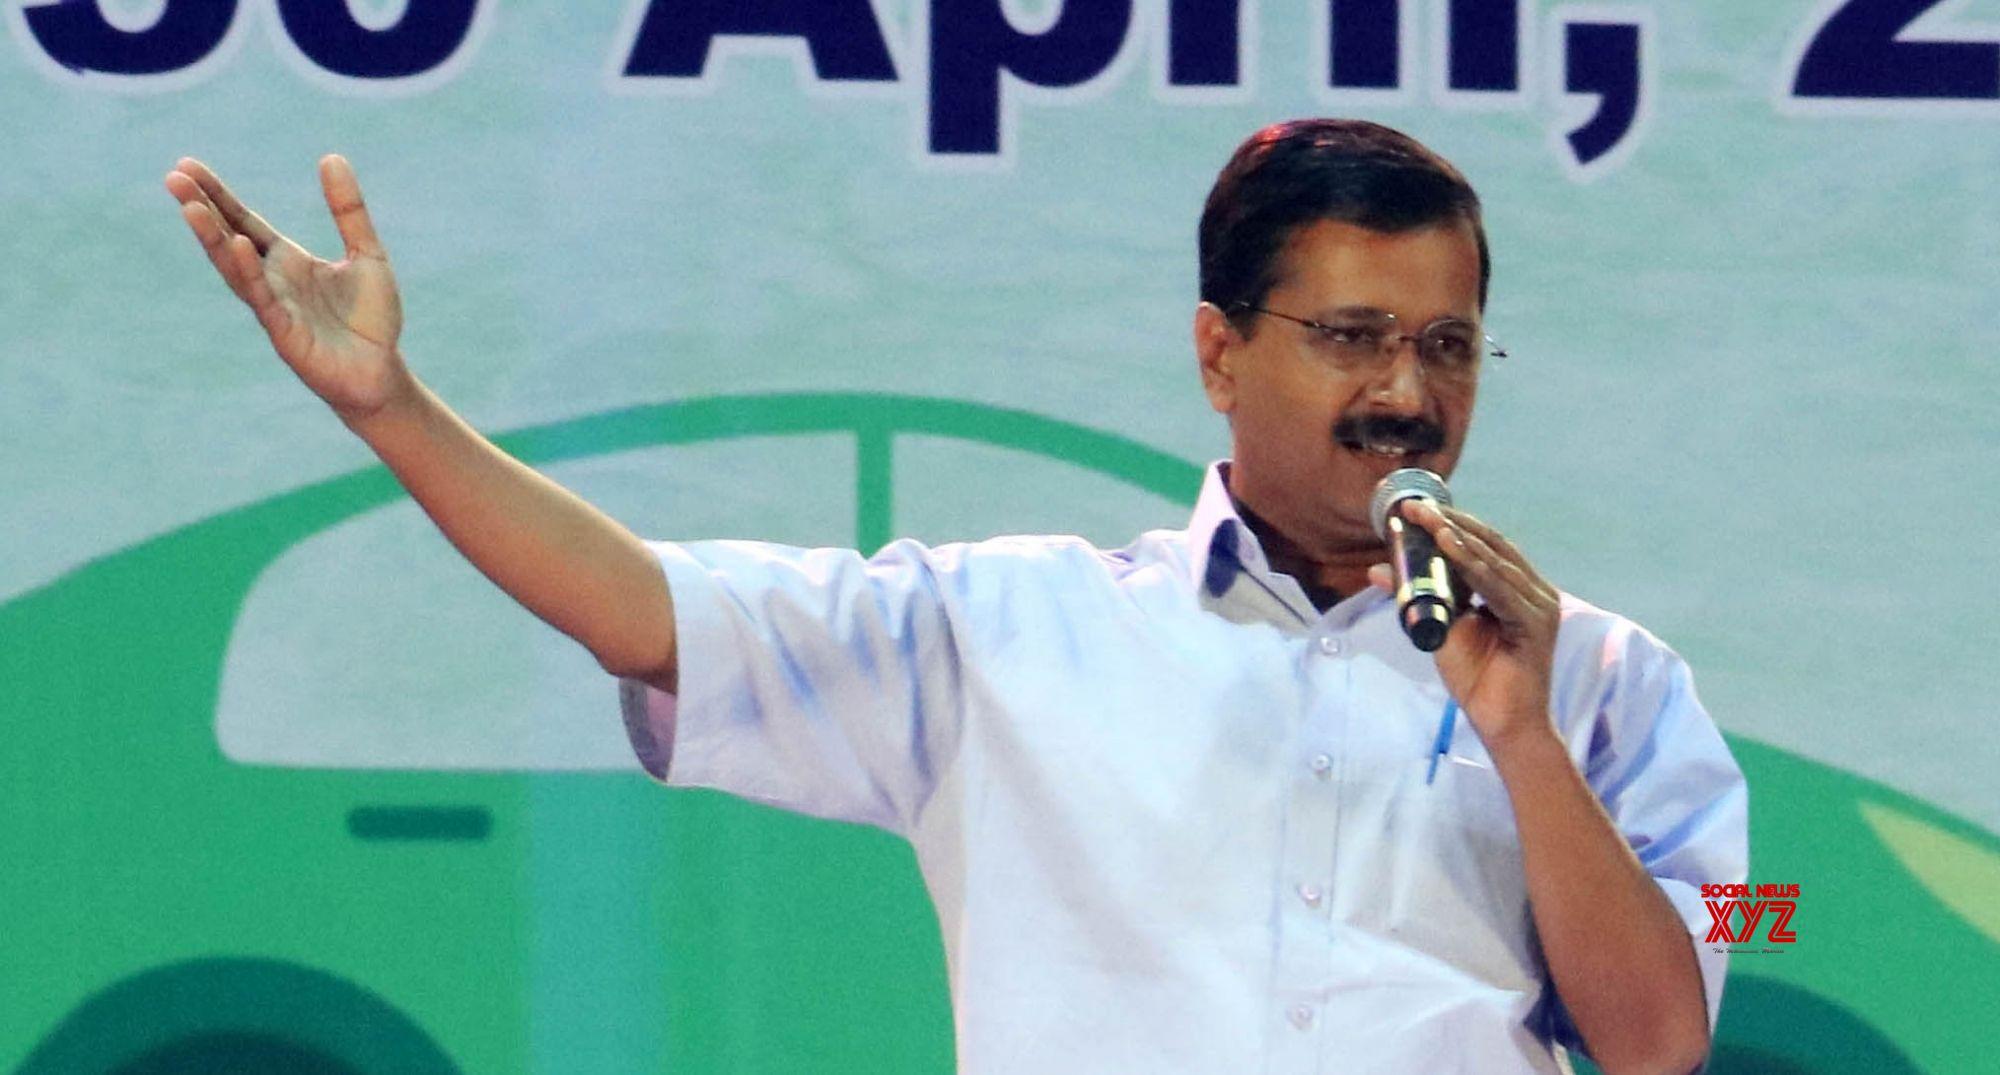 AAP's free WiFi promise for Delhi still a dream